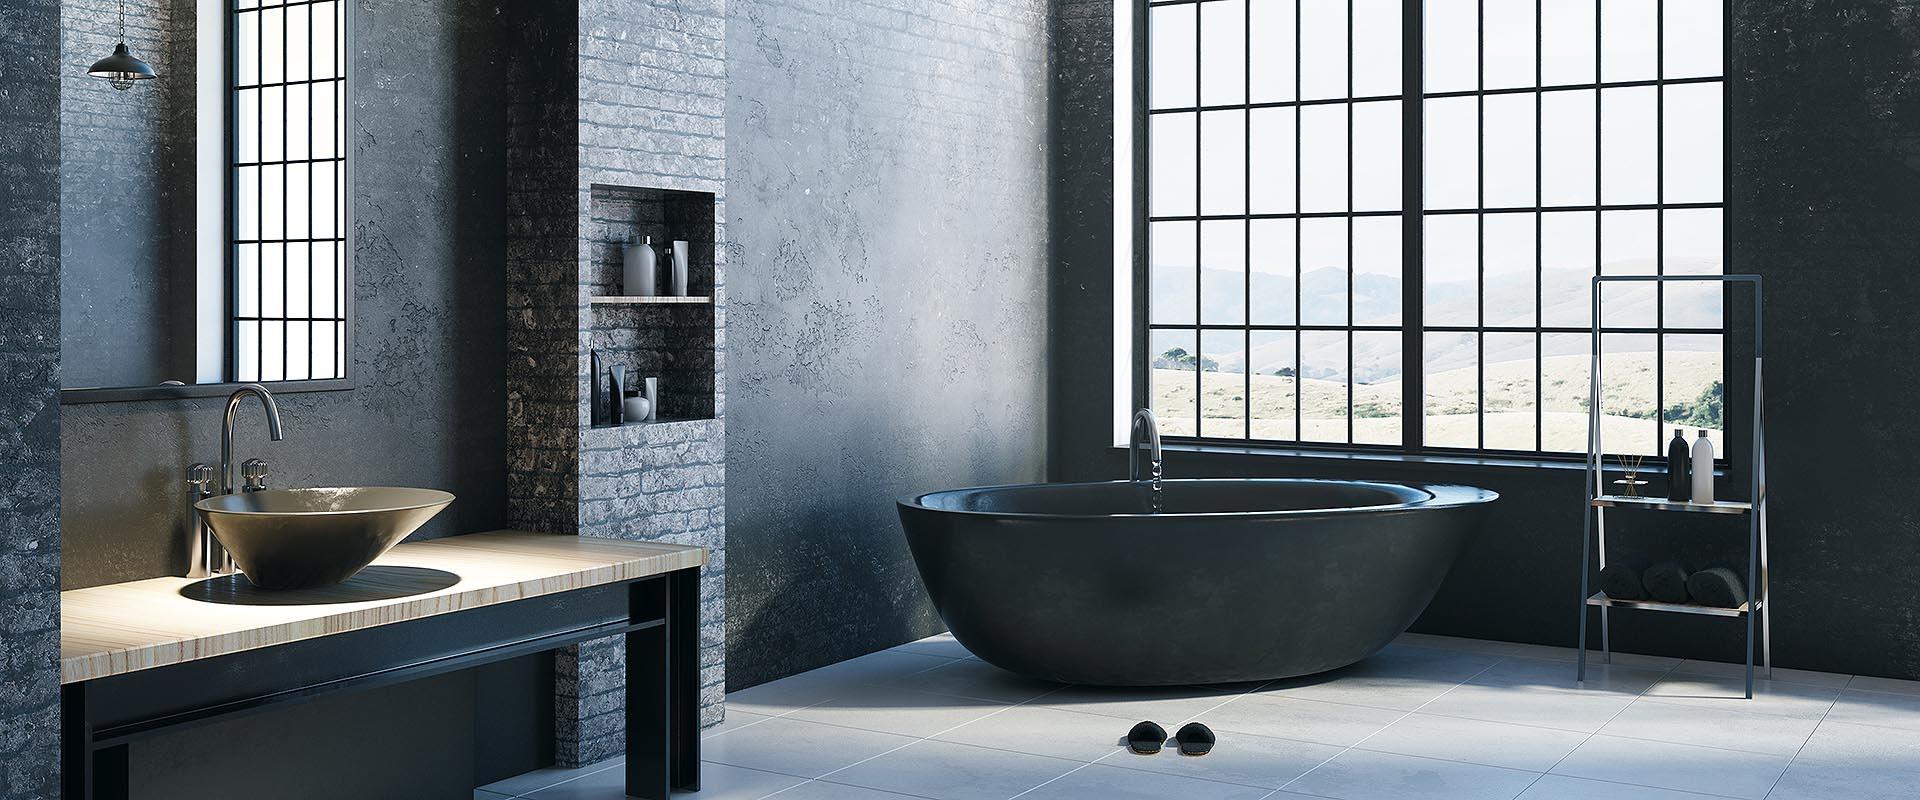 Salle De Bain Industrielle salle de bain style industriel | ciot